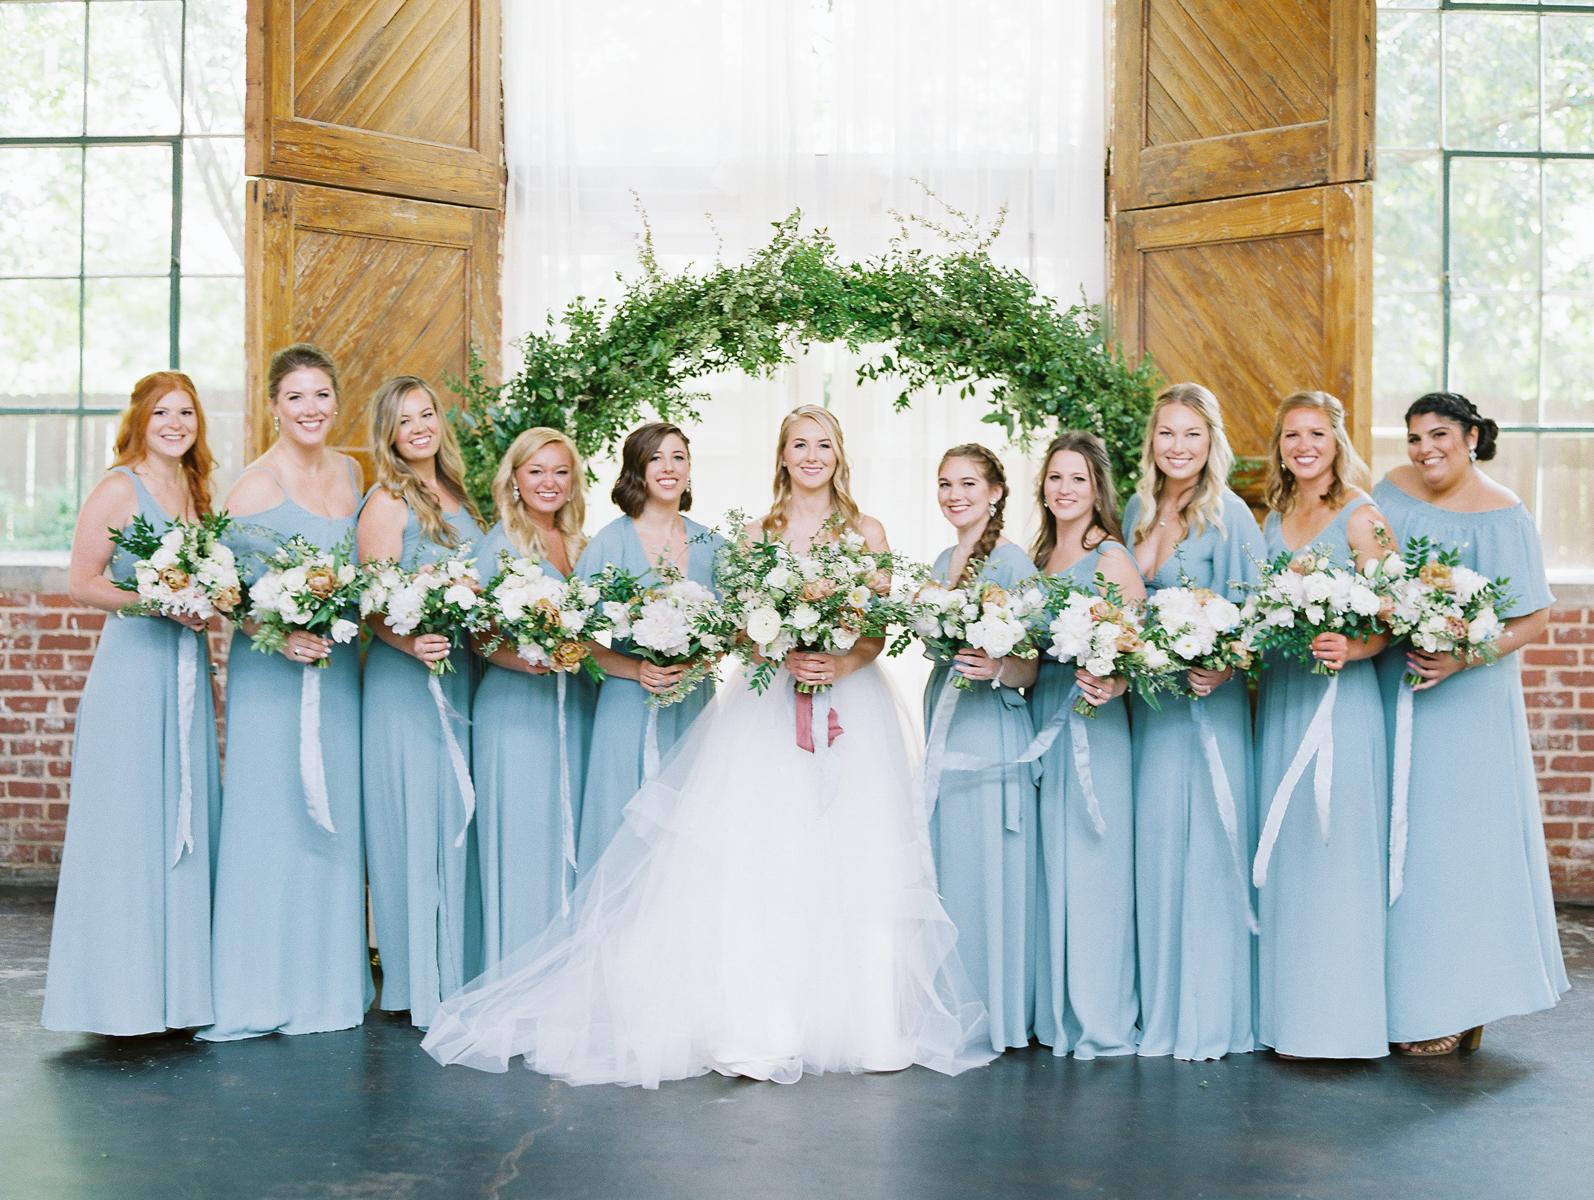 Foundry-At-Puritan-Mill-wedding-photos-venue-atlanta-fine-art-film-photographer22.JPG